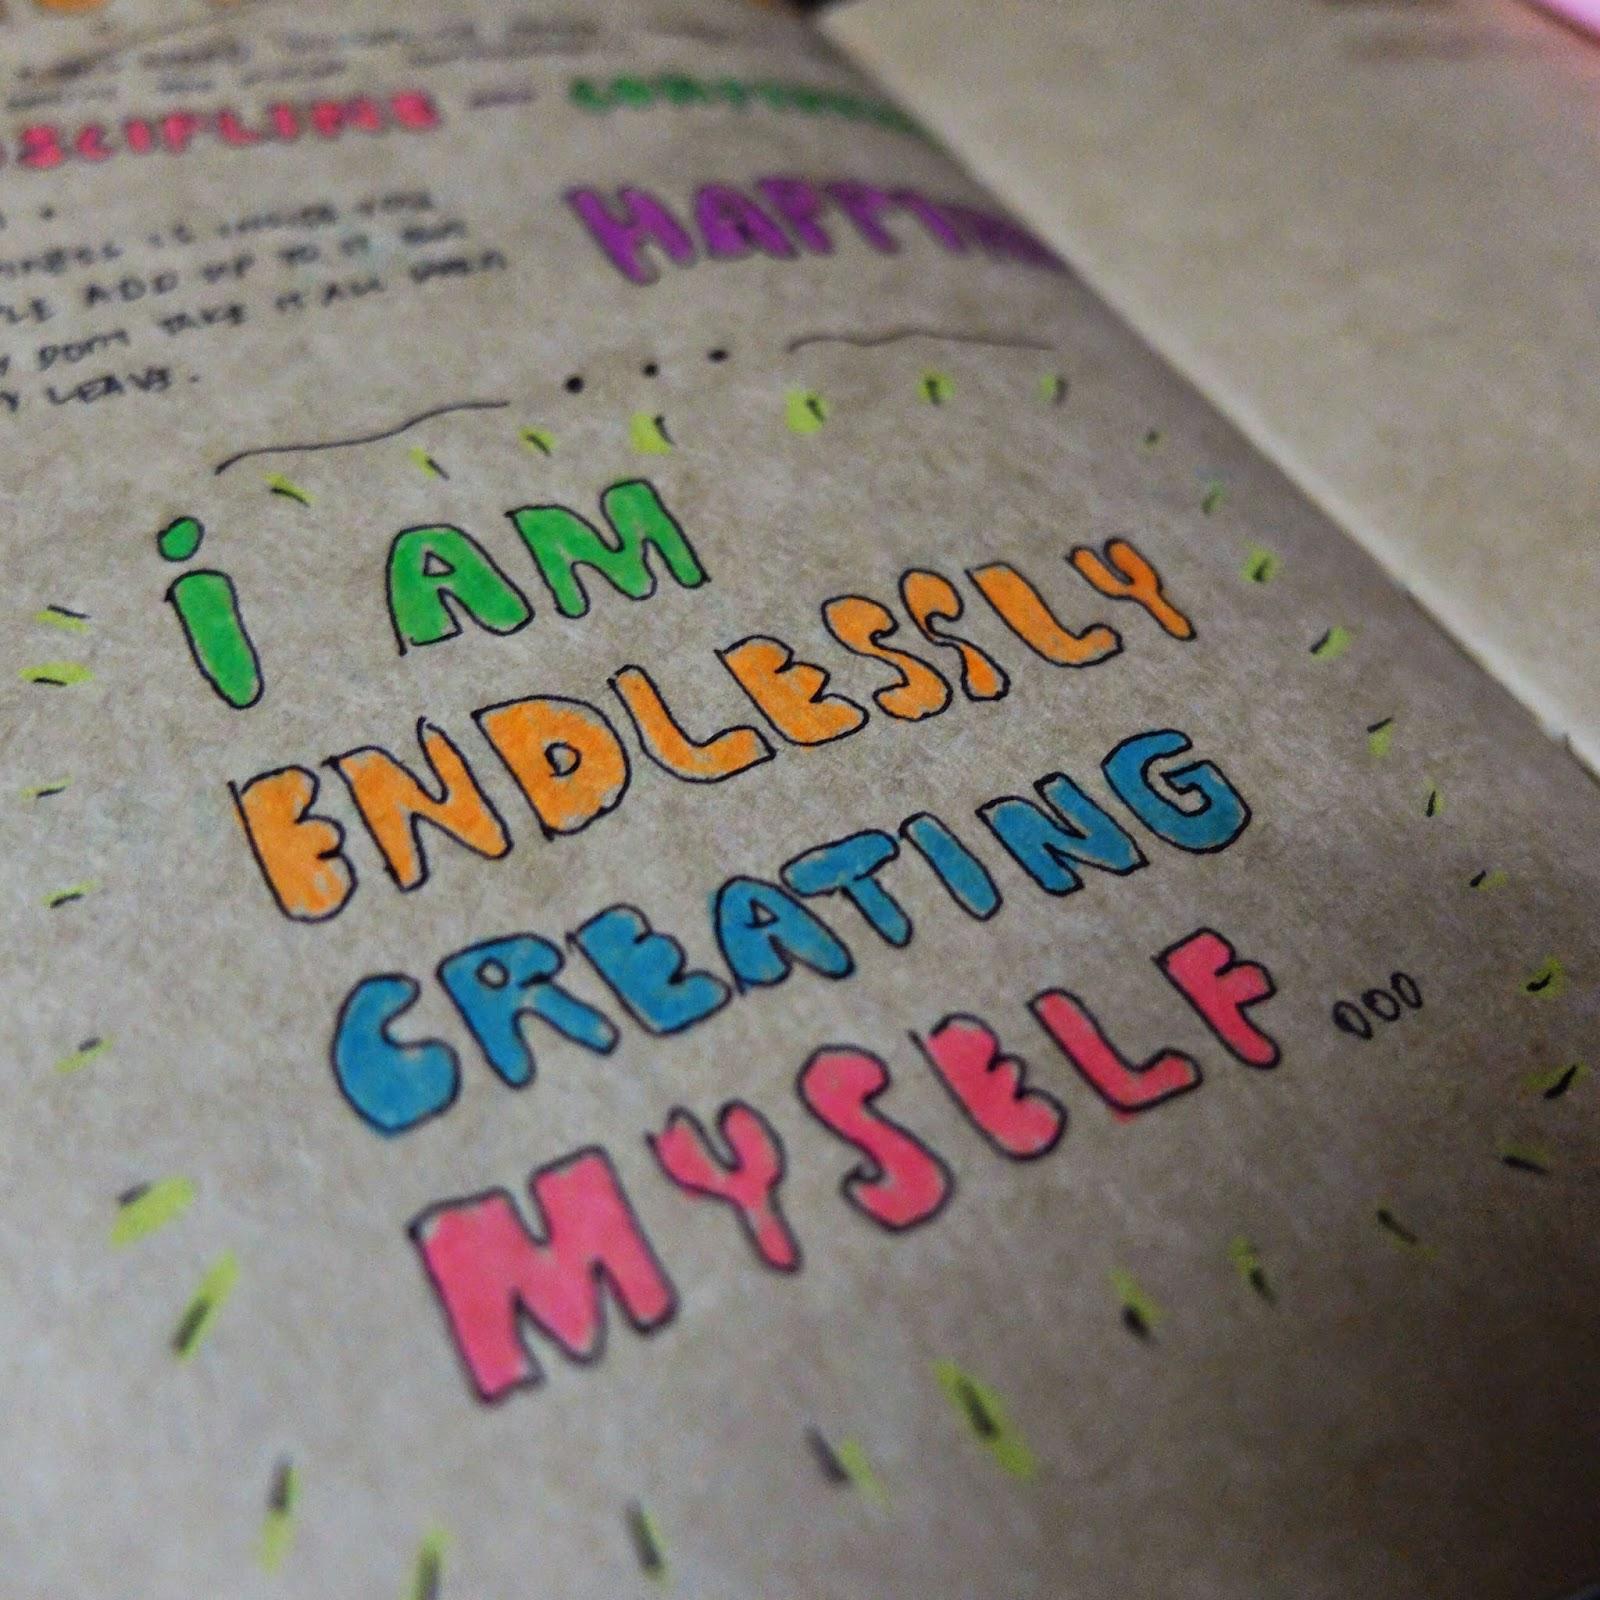 I am endlessly creating myself.